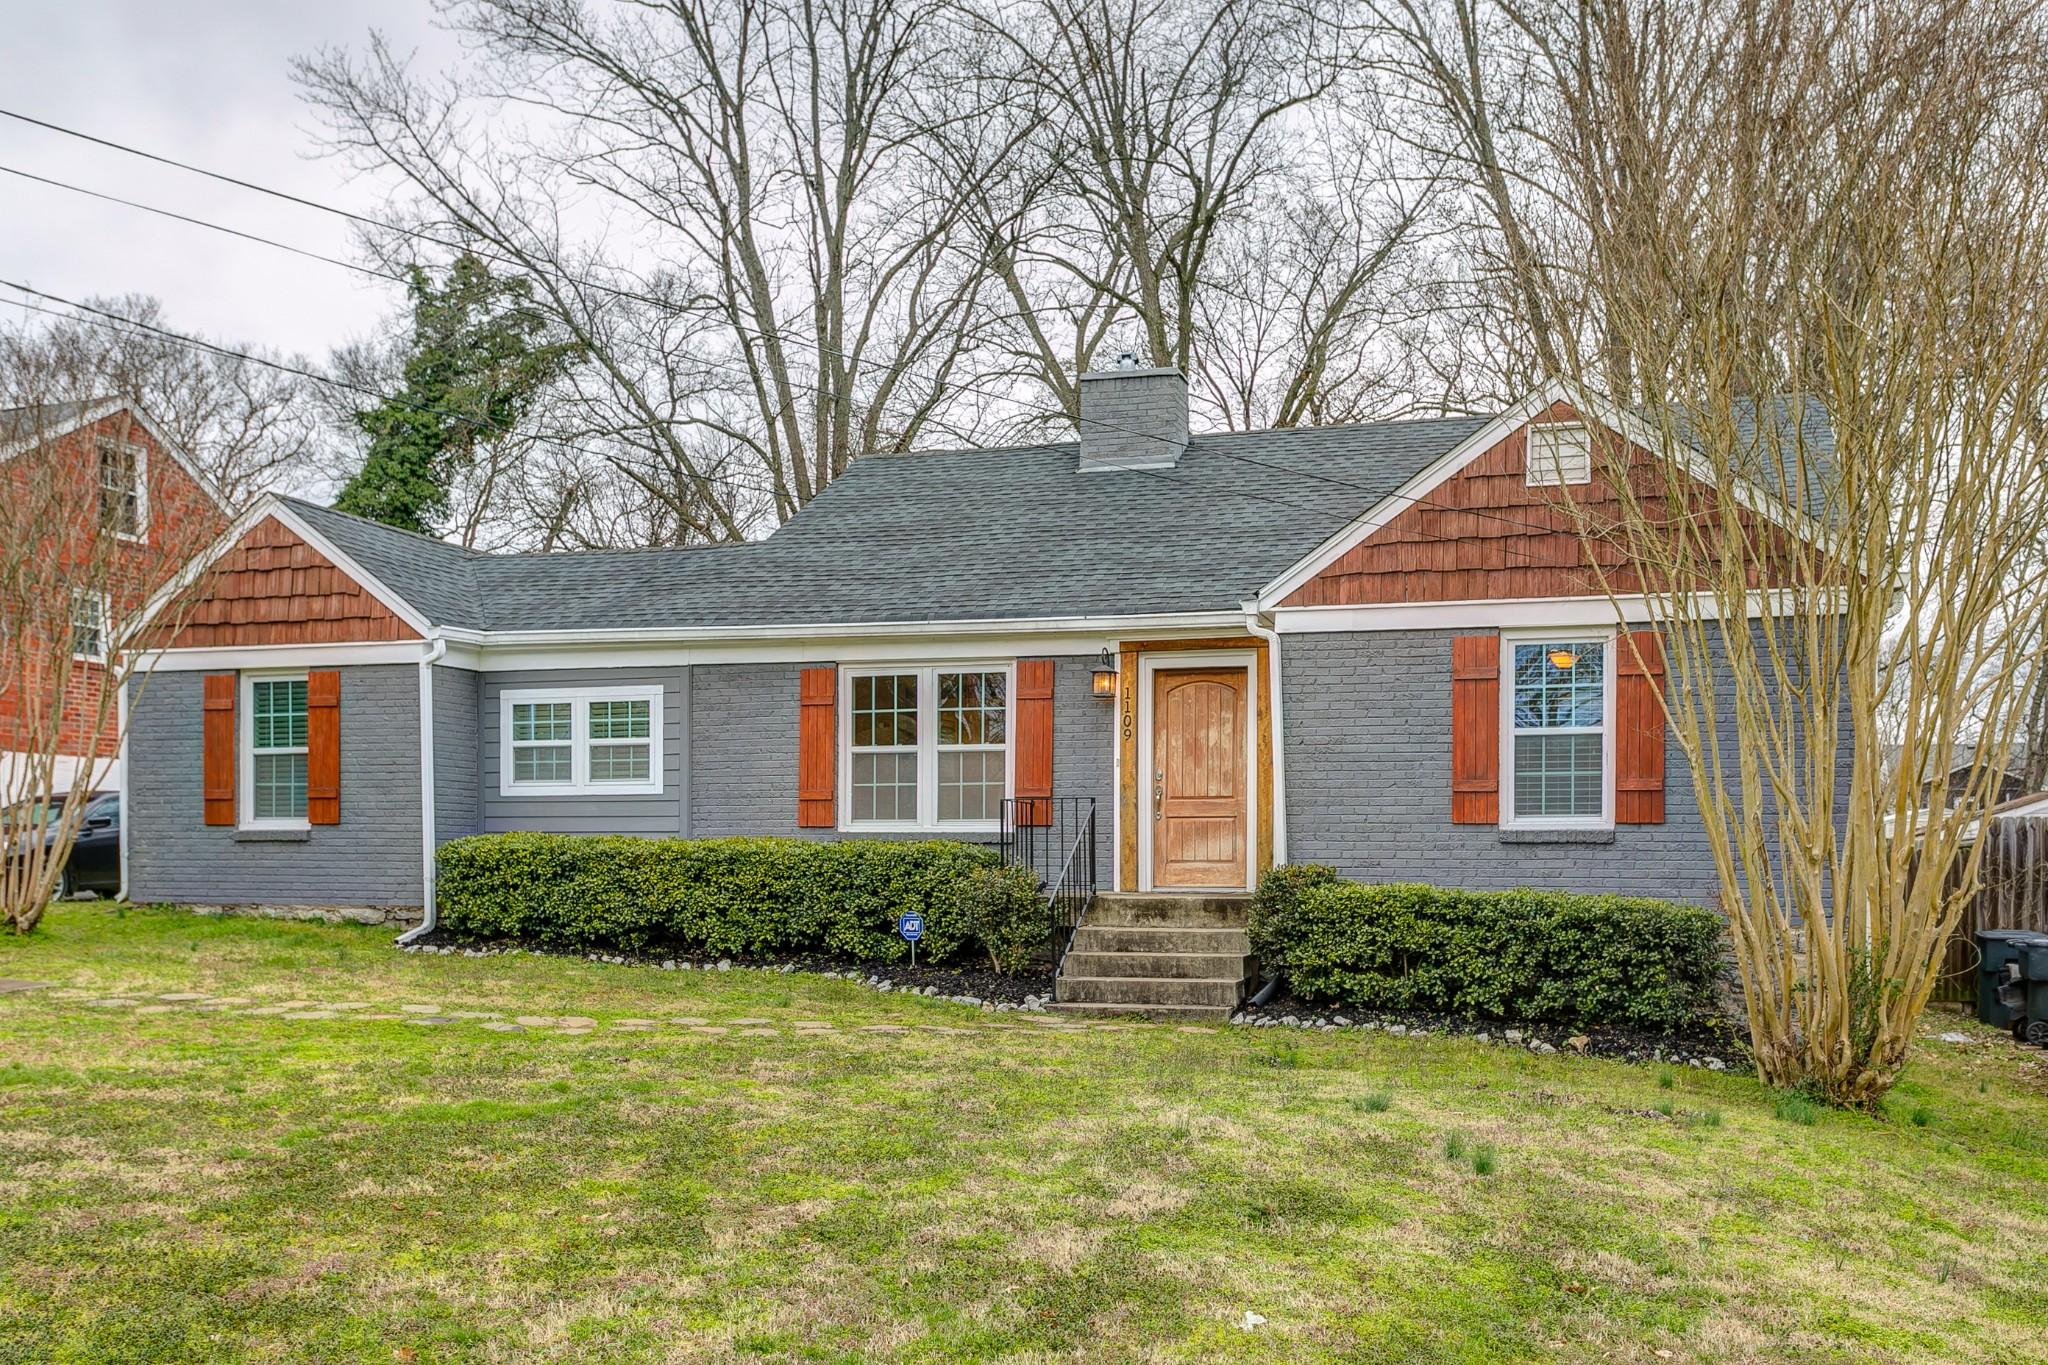 1109 Richmond Dr, Nashville, TN 37216 - Nashville, TN real estate listing